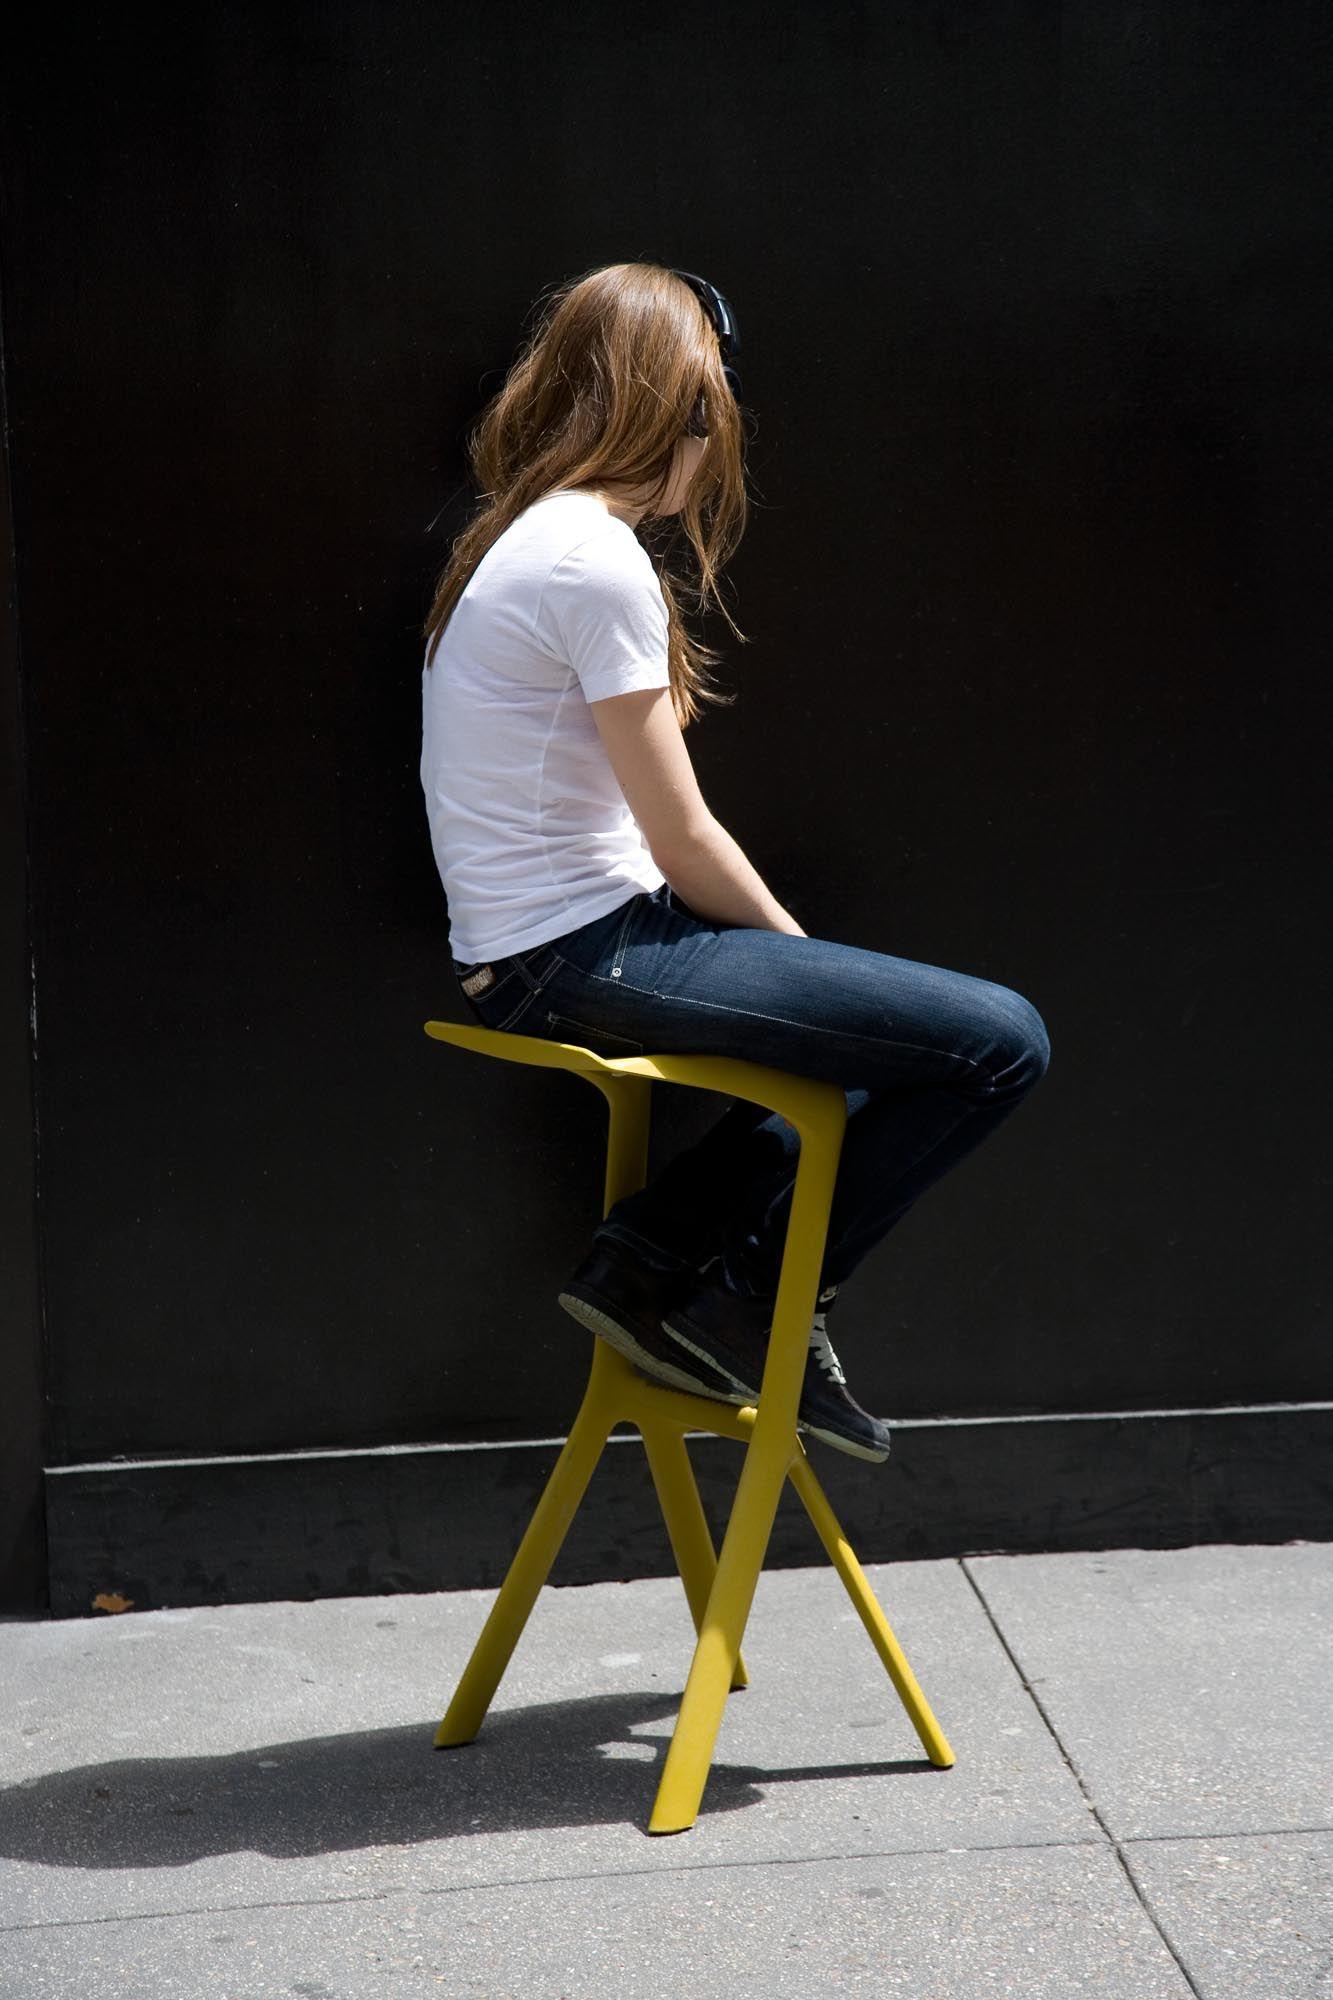 Konstantin grcic bar stool one stool design stools - Miura Stool Designed By Konstantin Grcic For Plank Photo From The Book Miura Stool